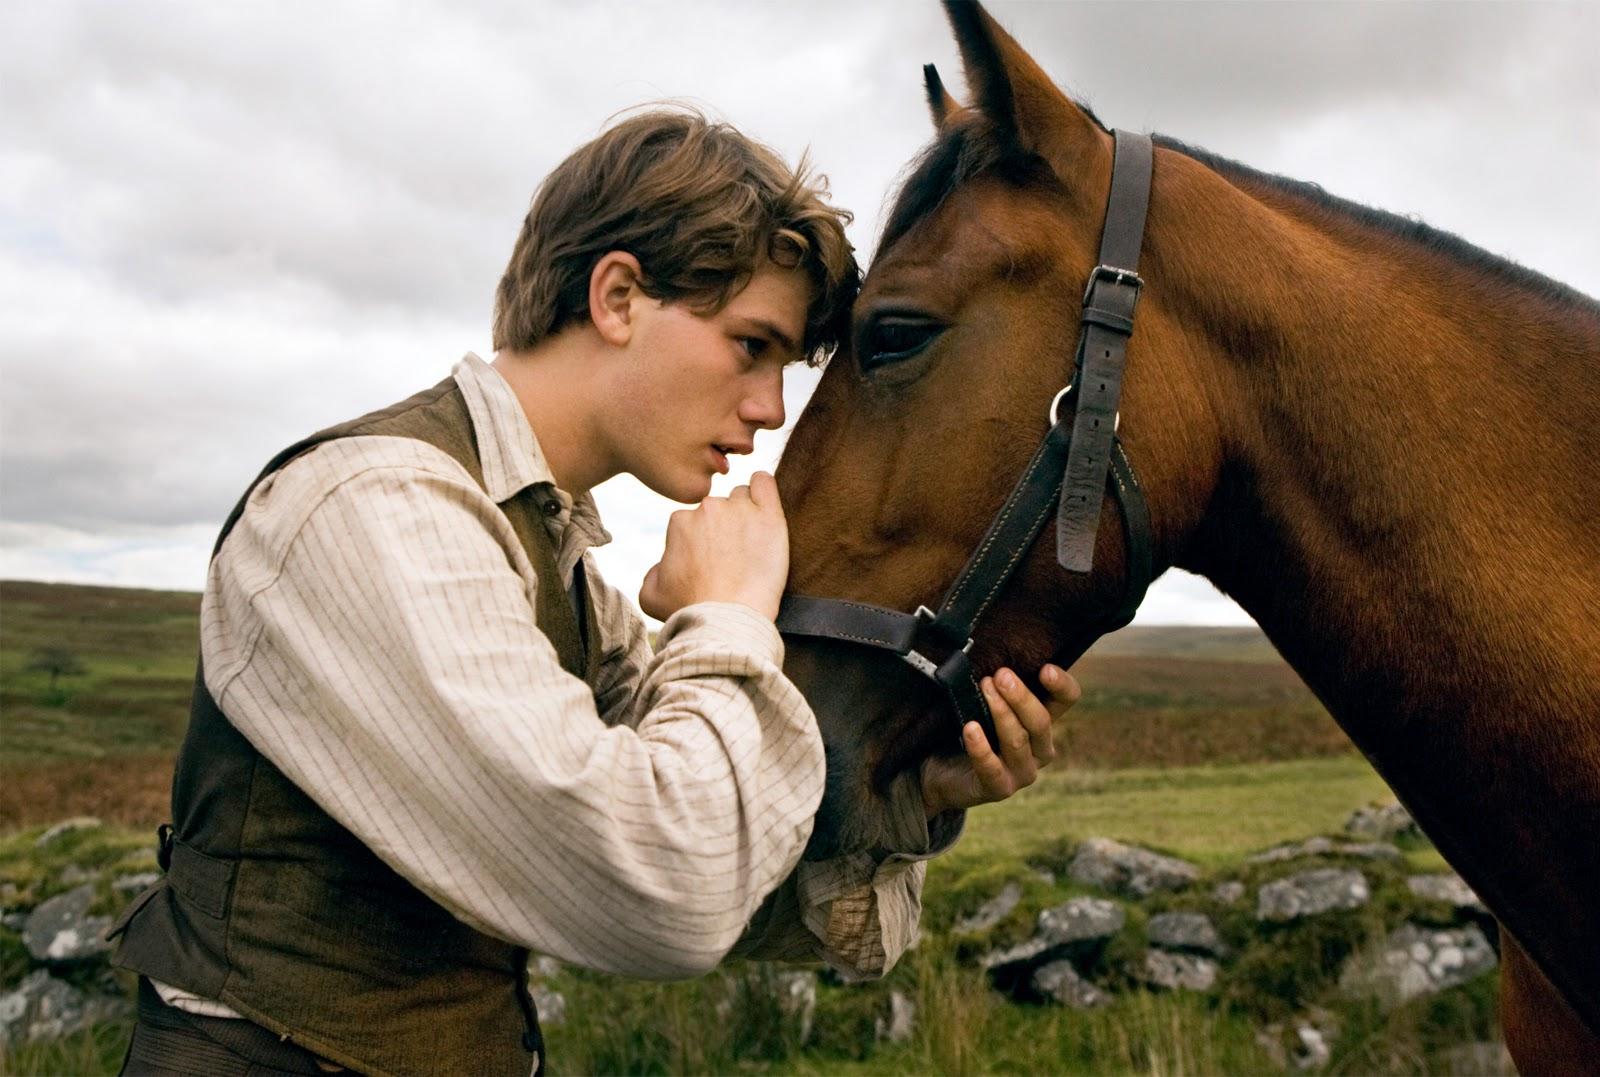 http://4.bp.blogspot.com/-mQLvNCDs620/Twqsz2MYzmI/AAAAAAAAAWM/nOrurq48Y1Q/s1600/War+Horse.jpg